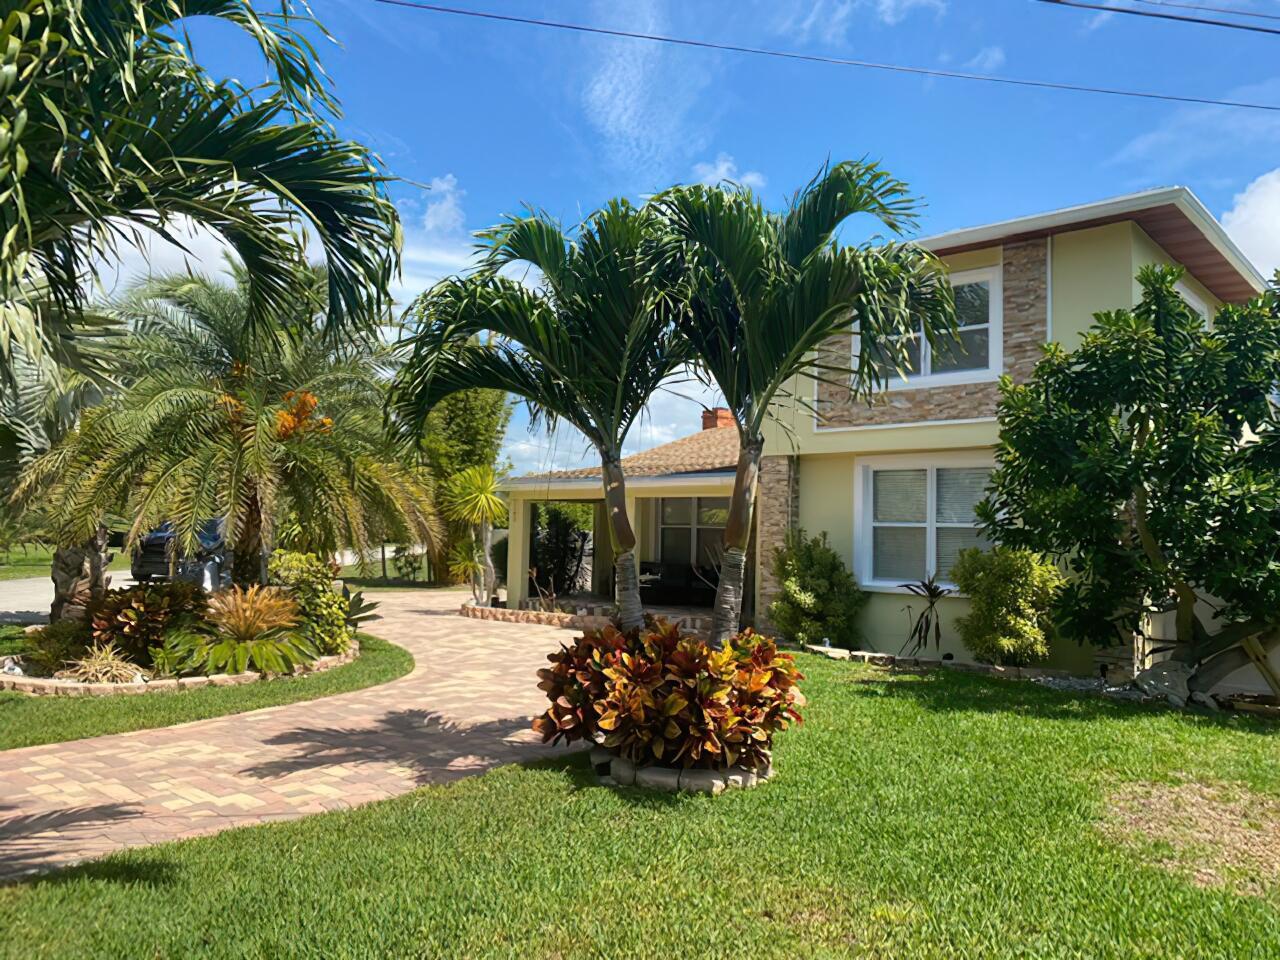 Home for sale in SUBURBAN HOMES Glen Ridge Florida